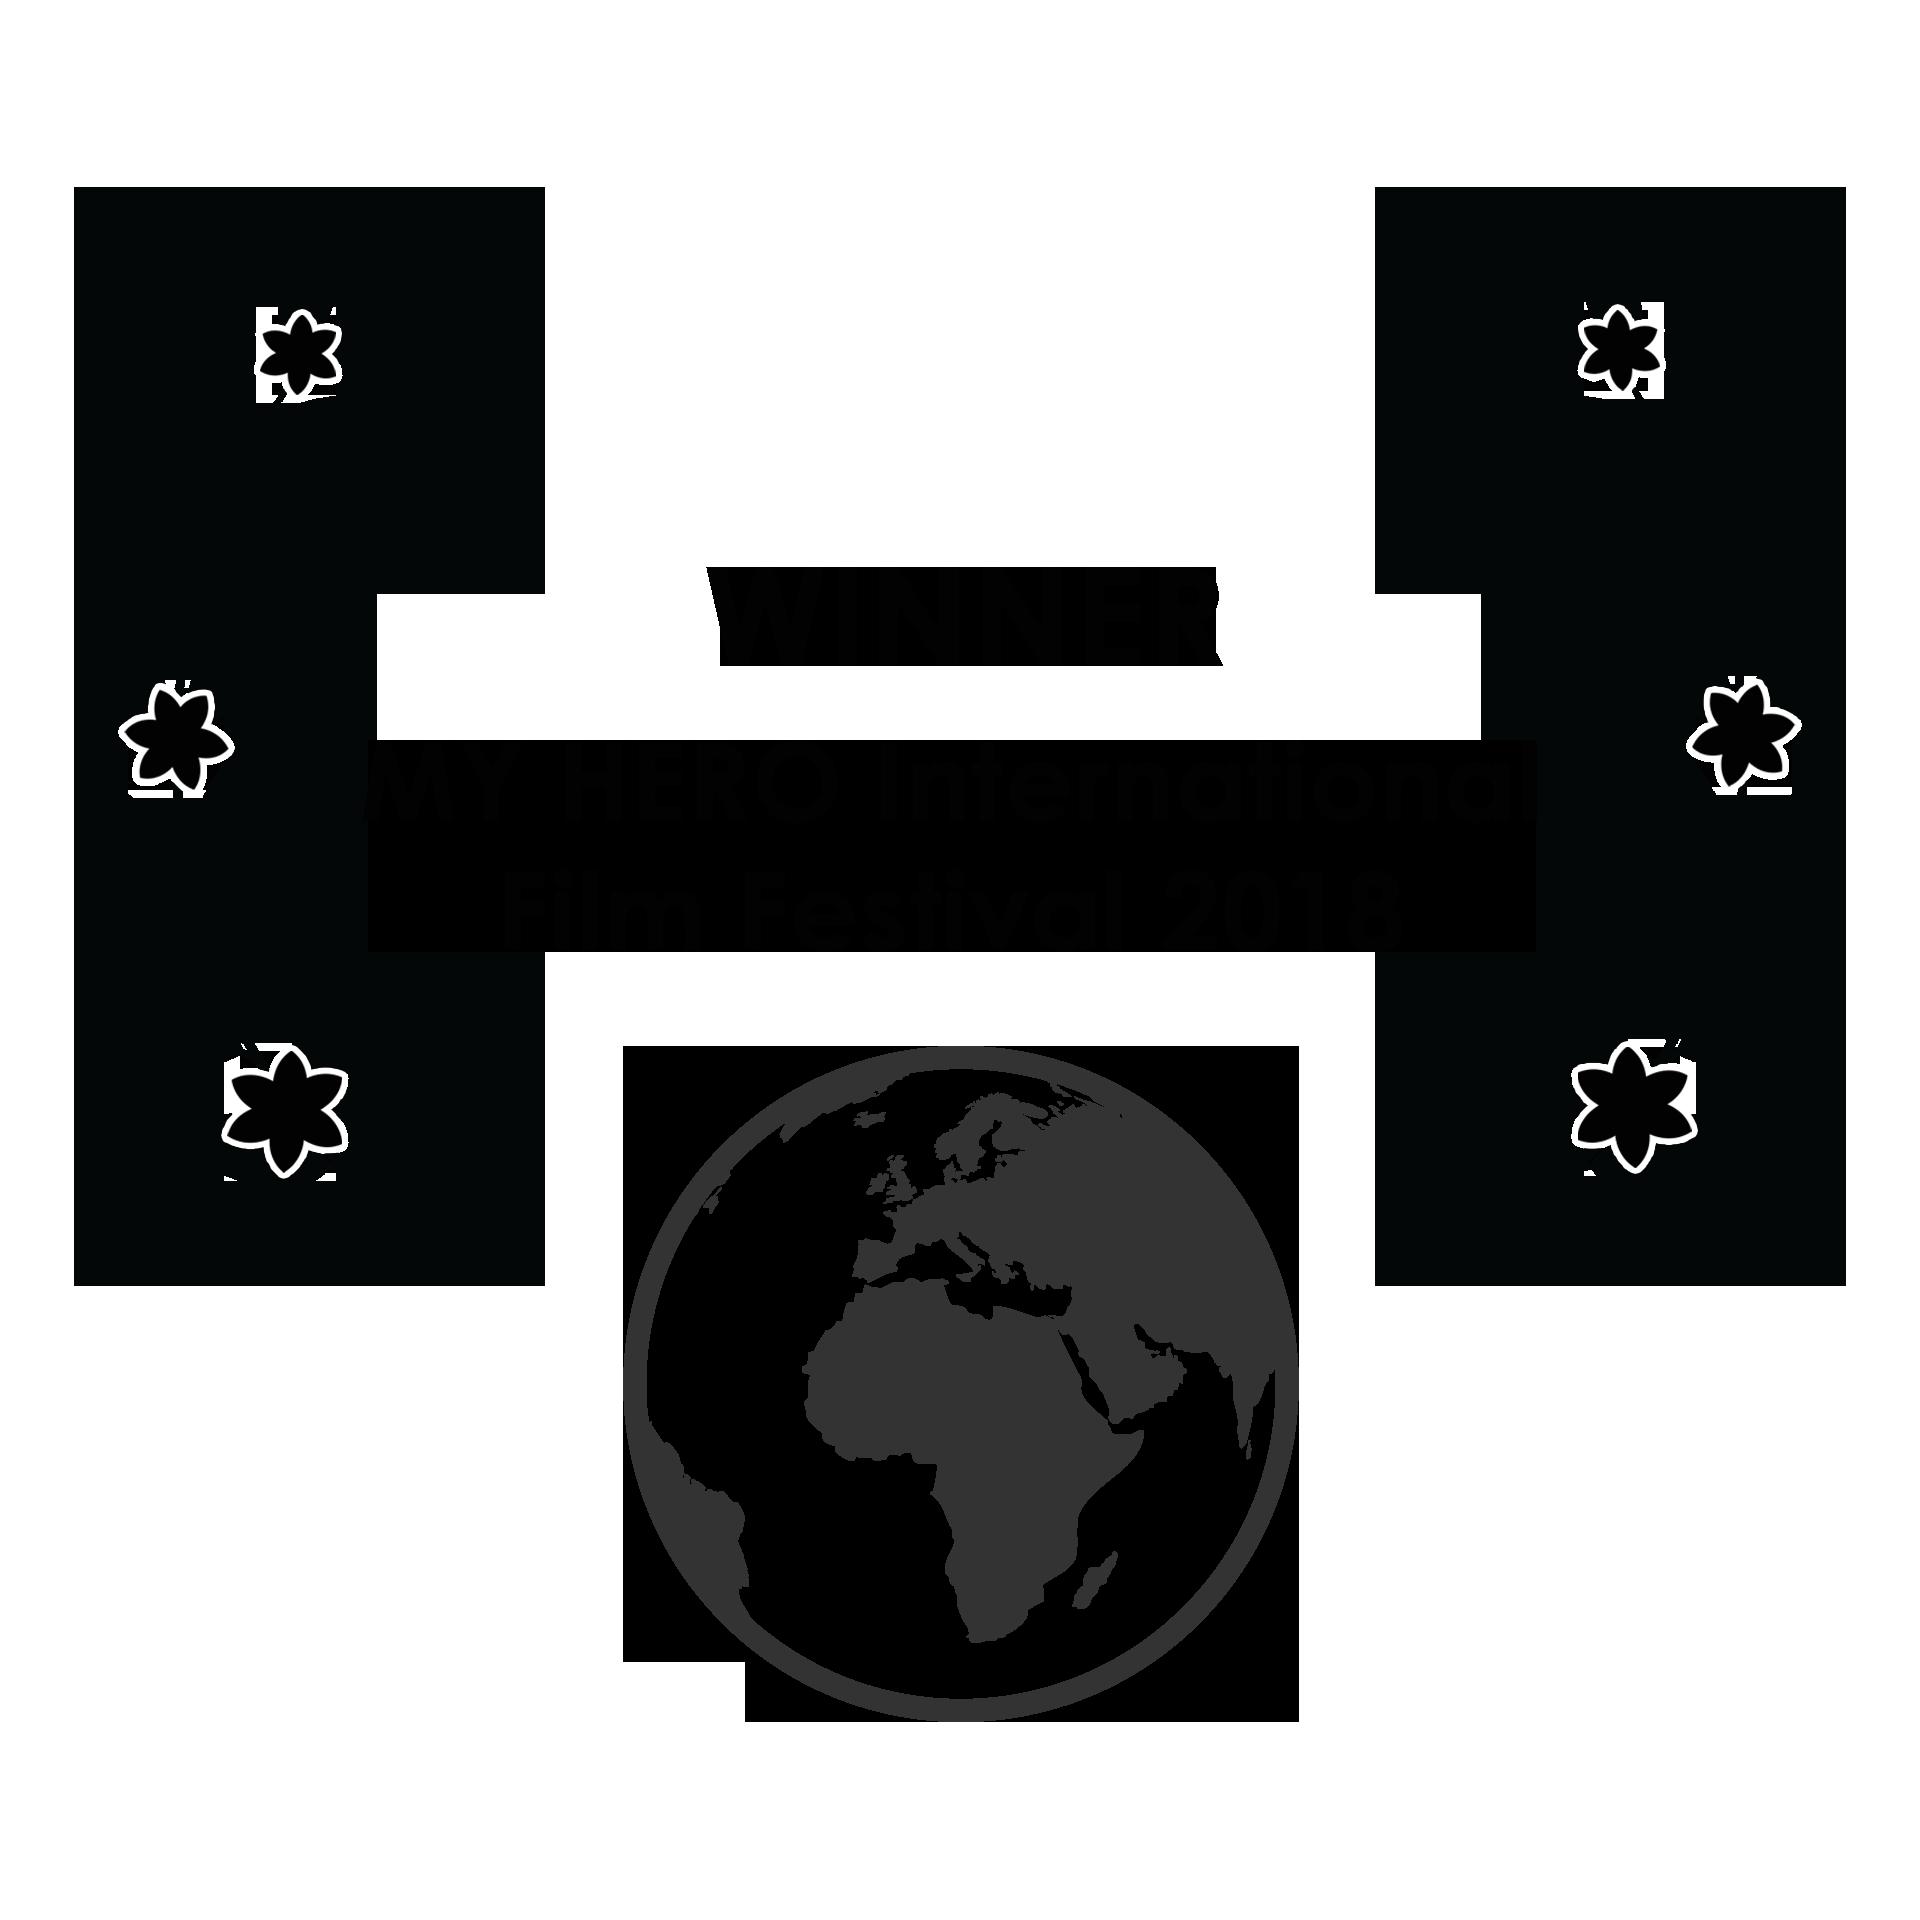 MHIFF 2018 WINNER LAUREL_black.png